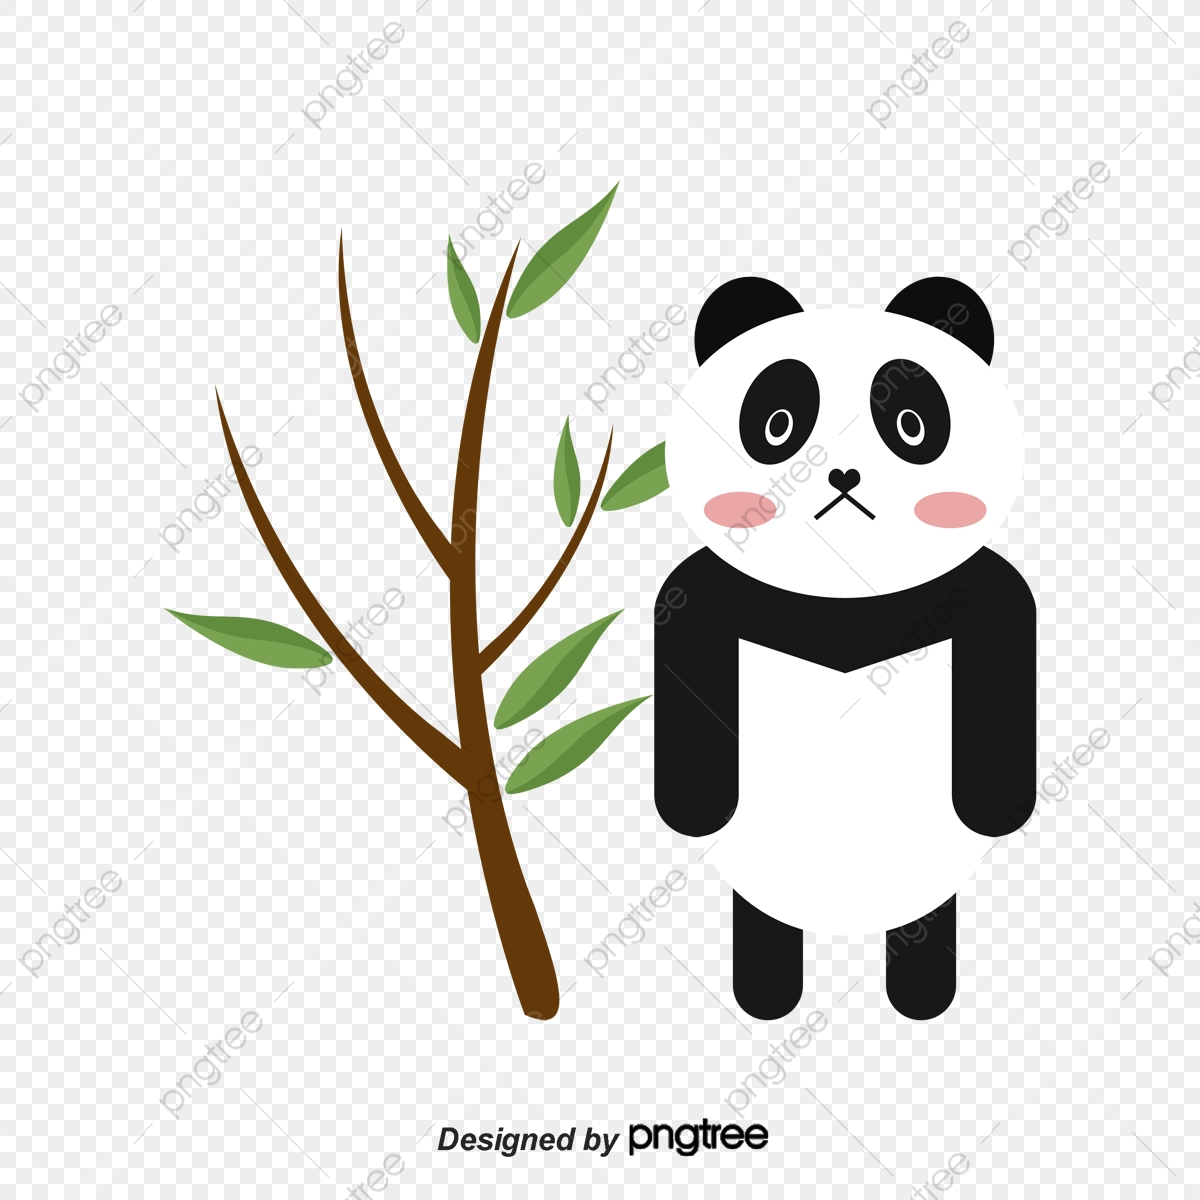 Limage De Dessin Panda Dessin Ae Fichier Vectoriel Png